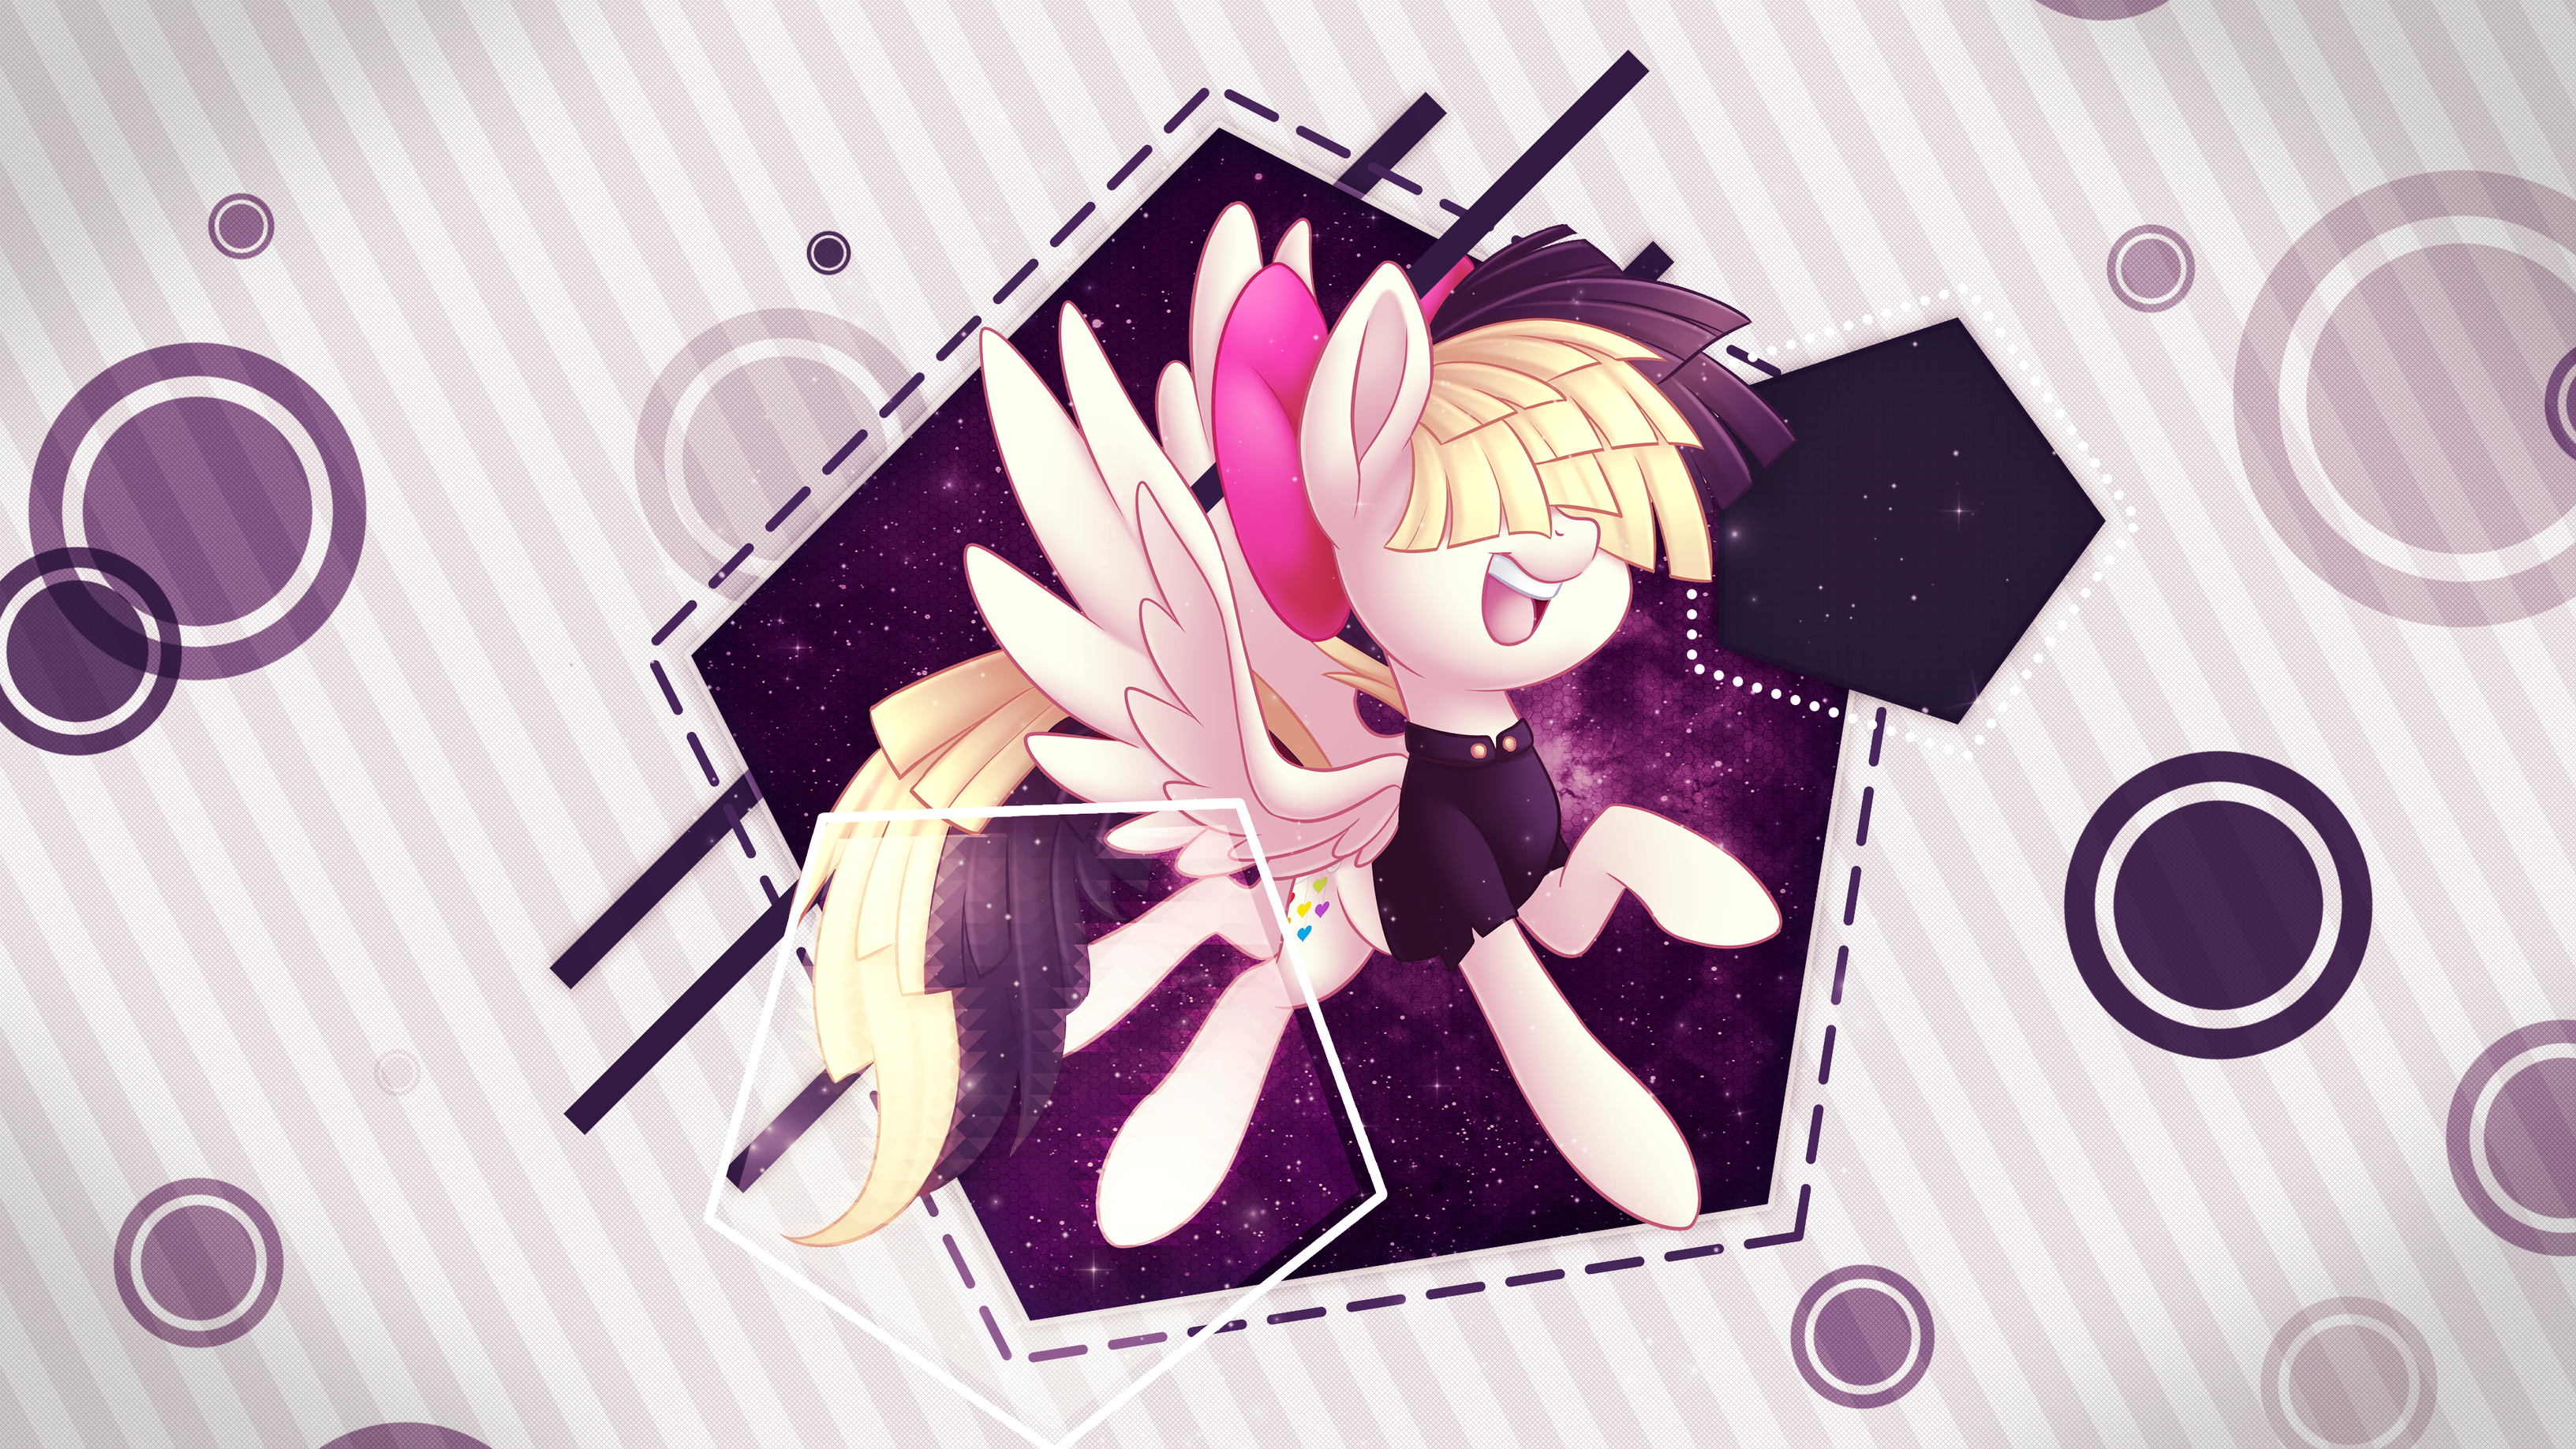 [Wallpaper] Songbird Serenade by skrayp